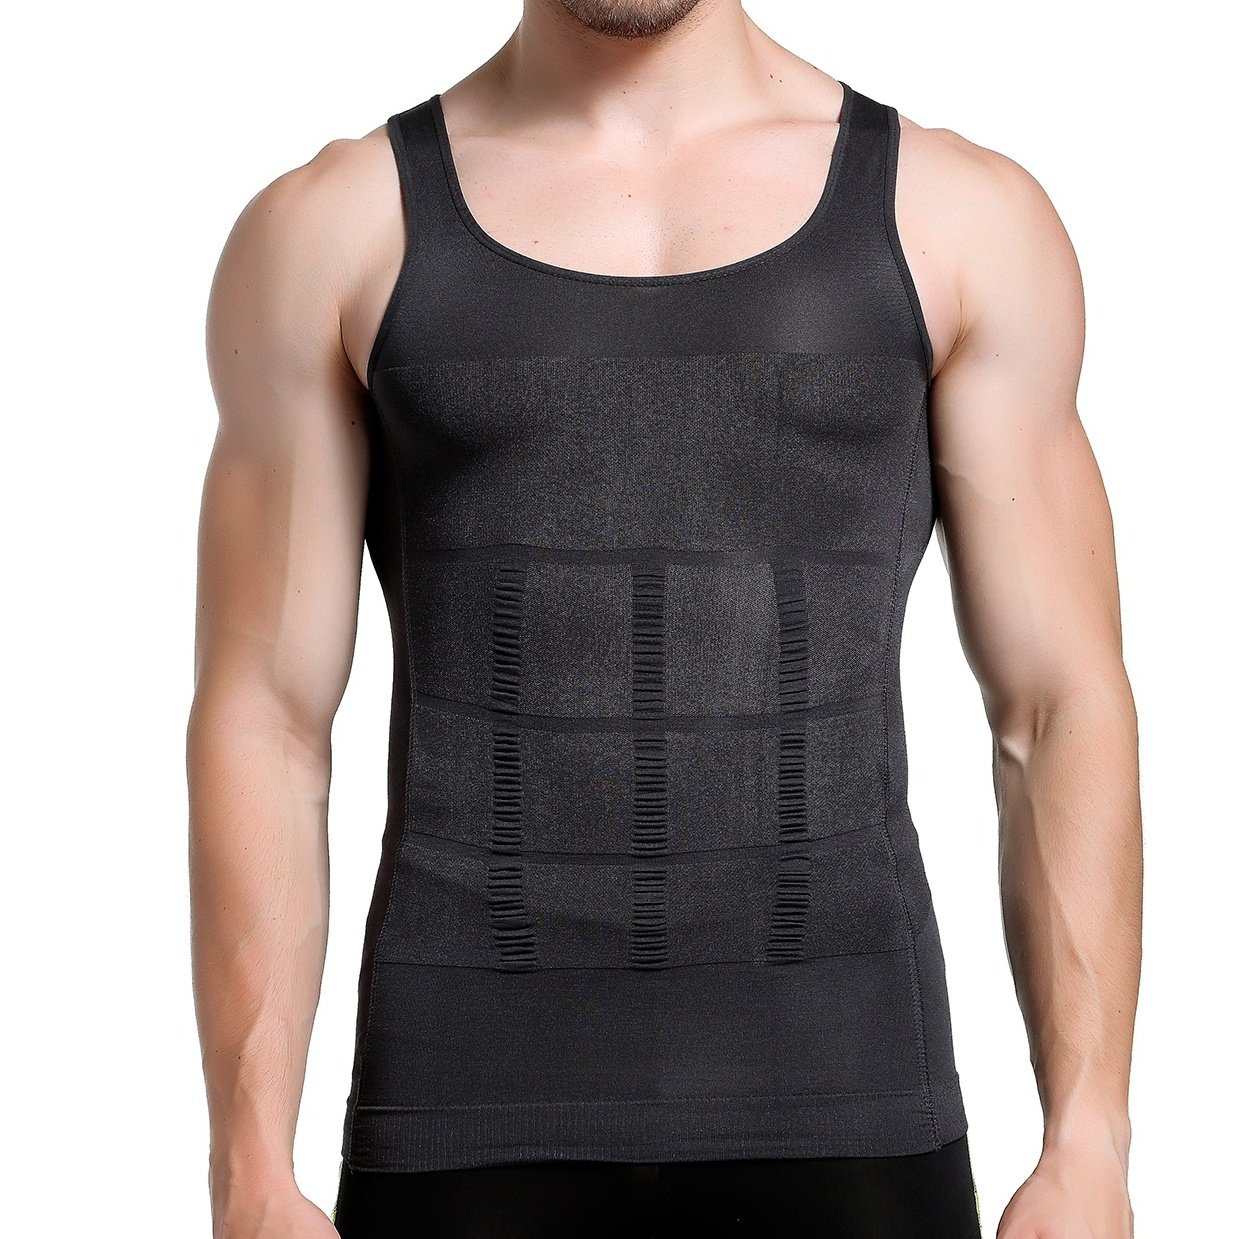 GKVK Mens Slimming Body Shaper Vest Shirt Abs Abdomen Slim,S(chest size76cm-81cm/30inches-32inches),Gray